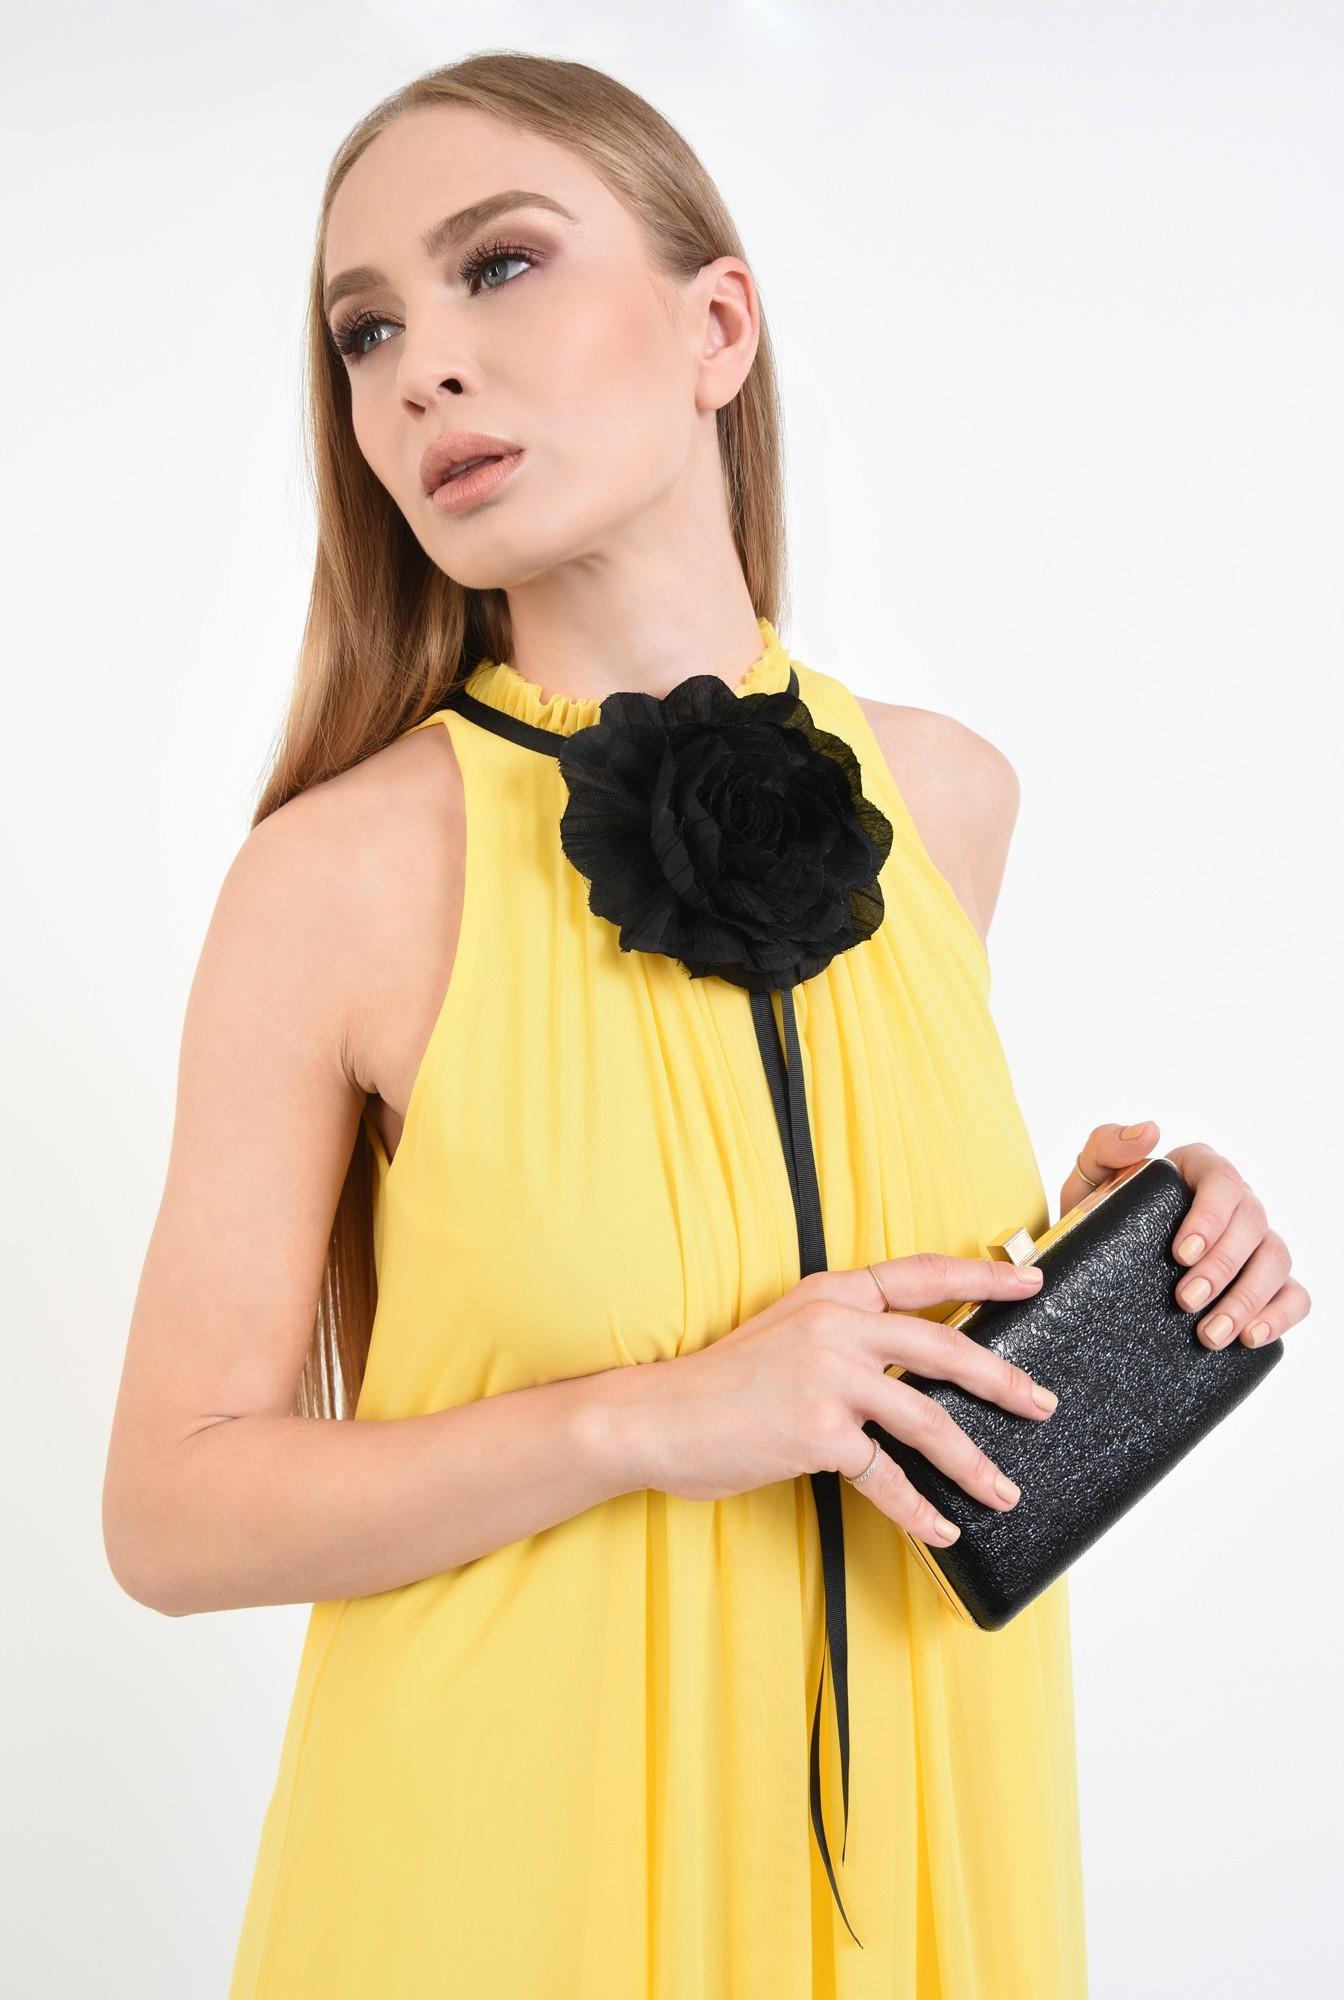 2 - plic elegant, negru, mini, grofrat, lant auriu